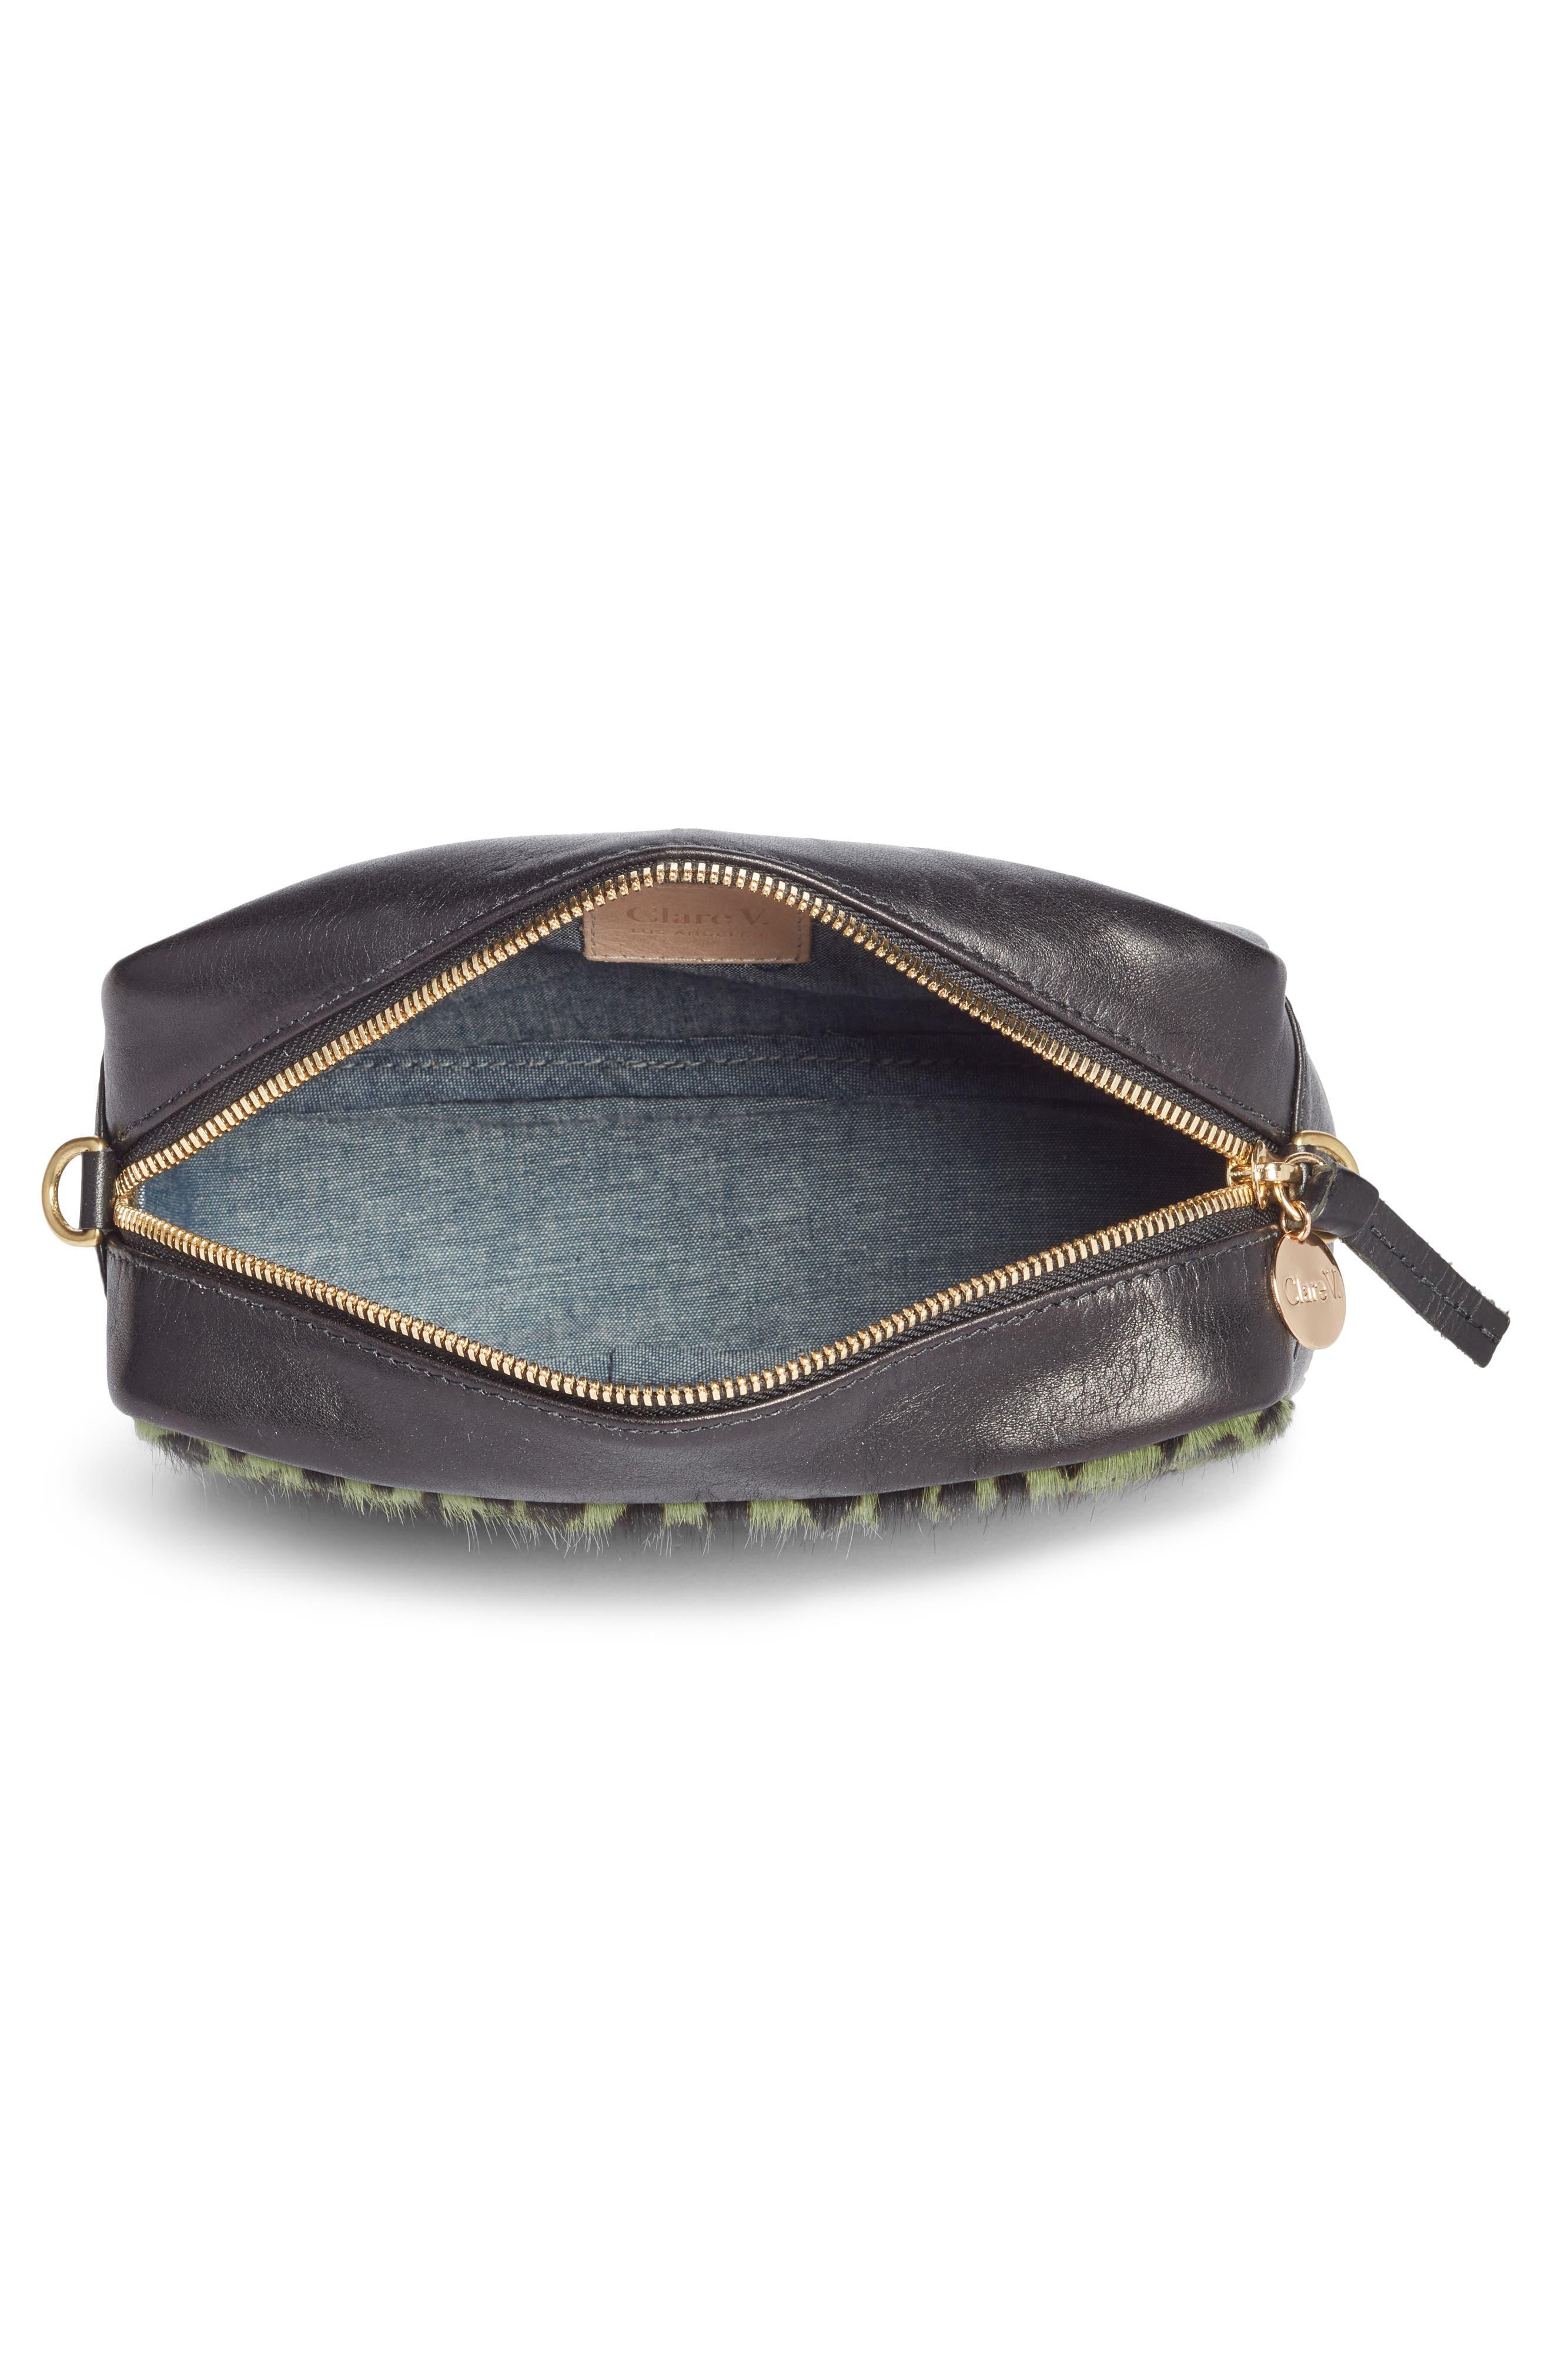 Midi Sac Leather & Genuine Calf Hair Shoulder Bag,                             Alternate thumbnail 4, color,                             Agave Leopard